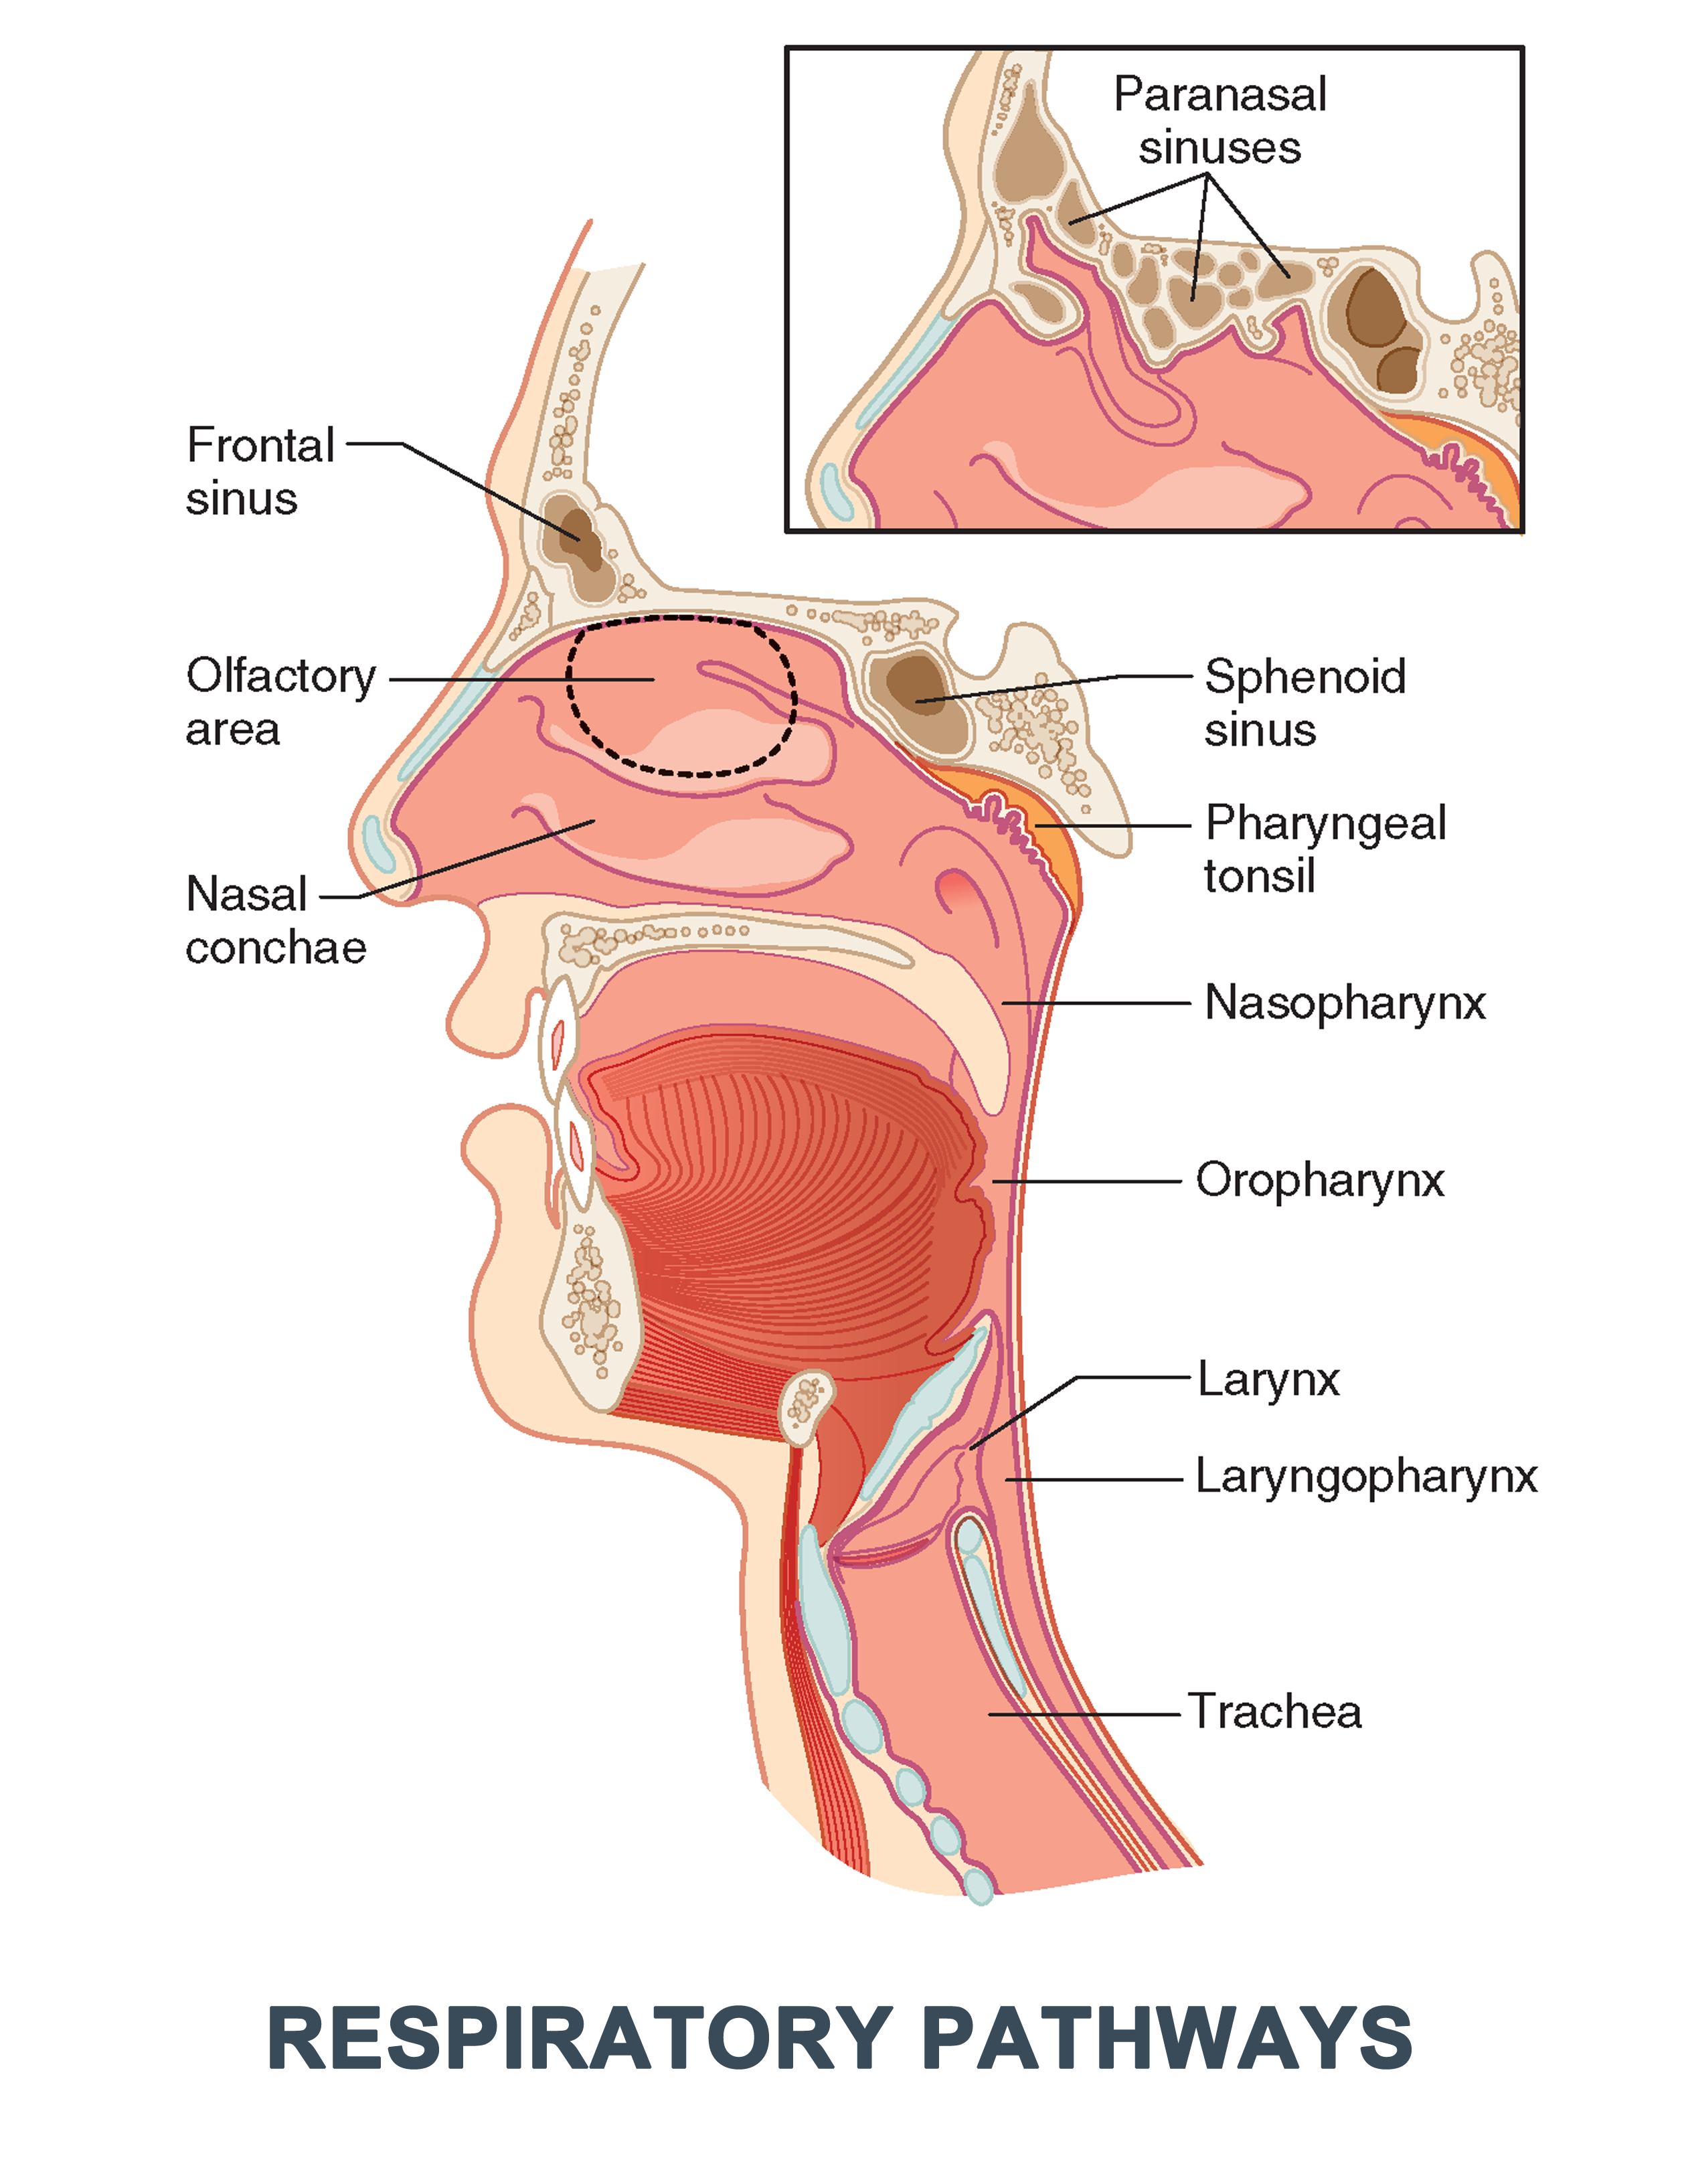 Anatomy For Cardiac Electrophysiologists A Practical Handbook 1st